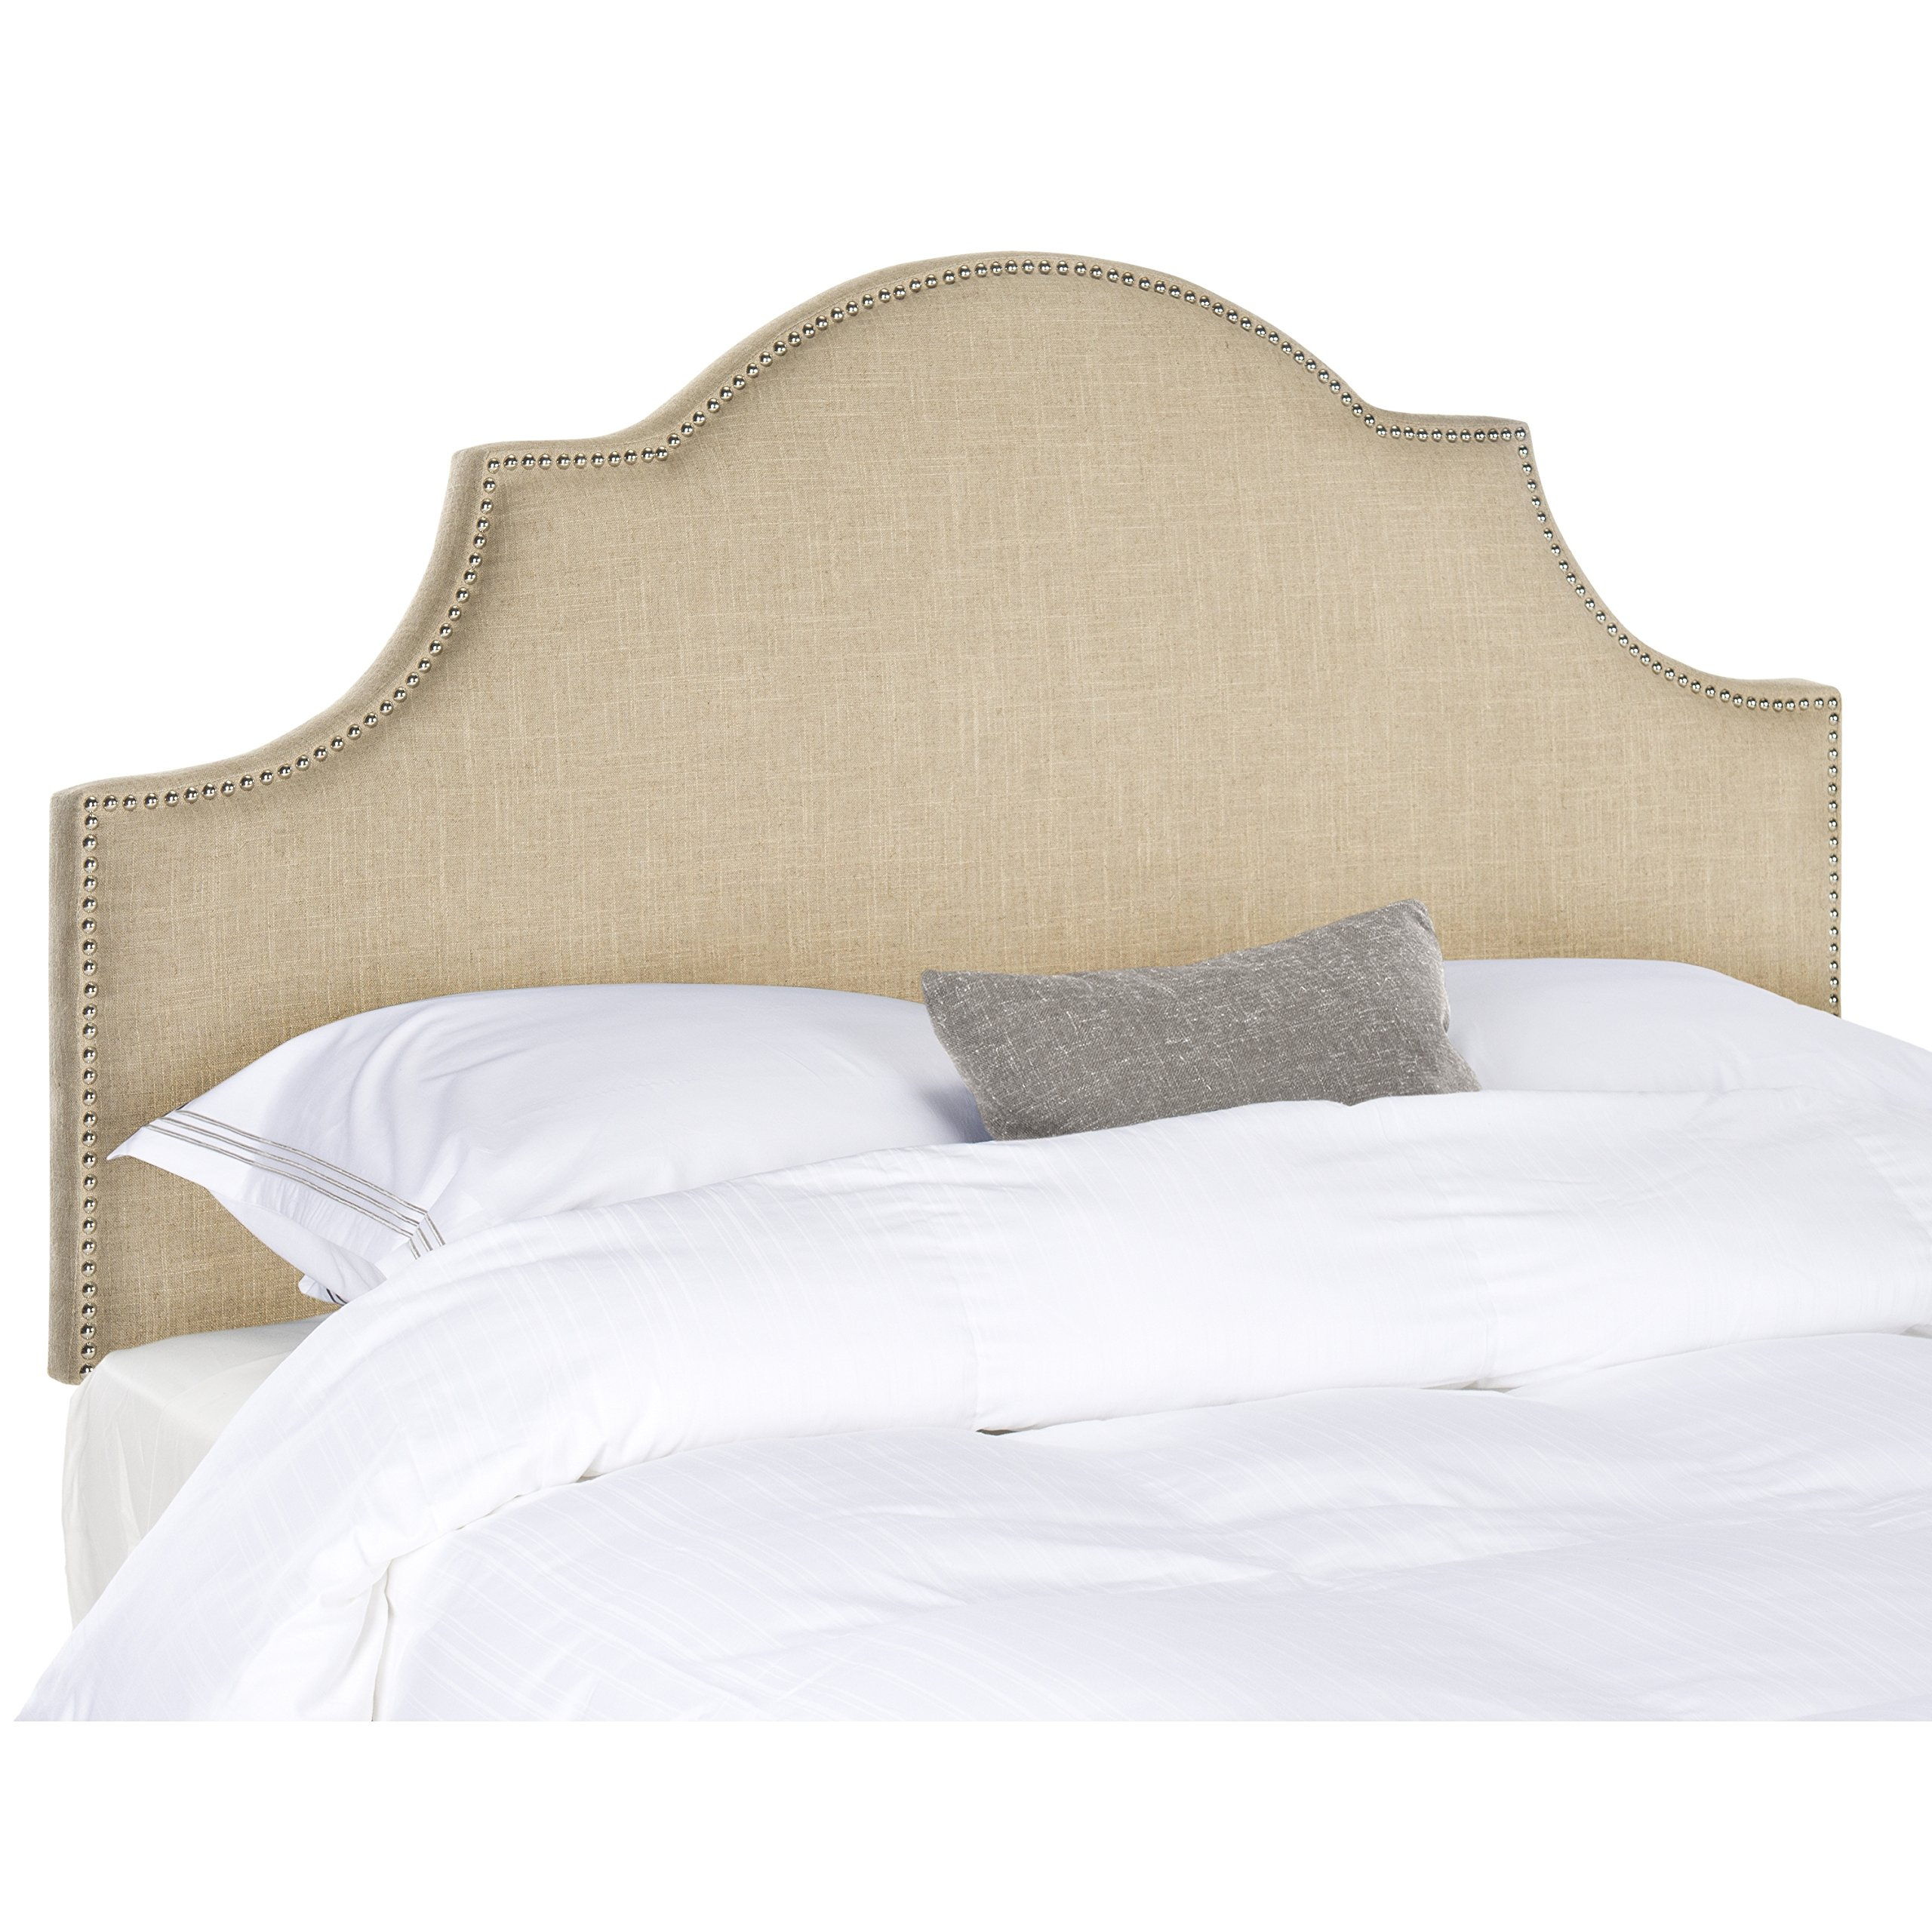 Safavieh Hallmar Hemp Linen Upholstered Arched Headboard - Silver Nailhead (King) by Safavieh (Image #1)